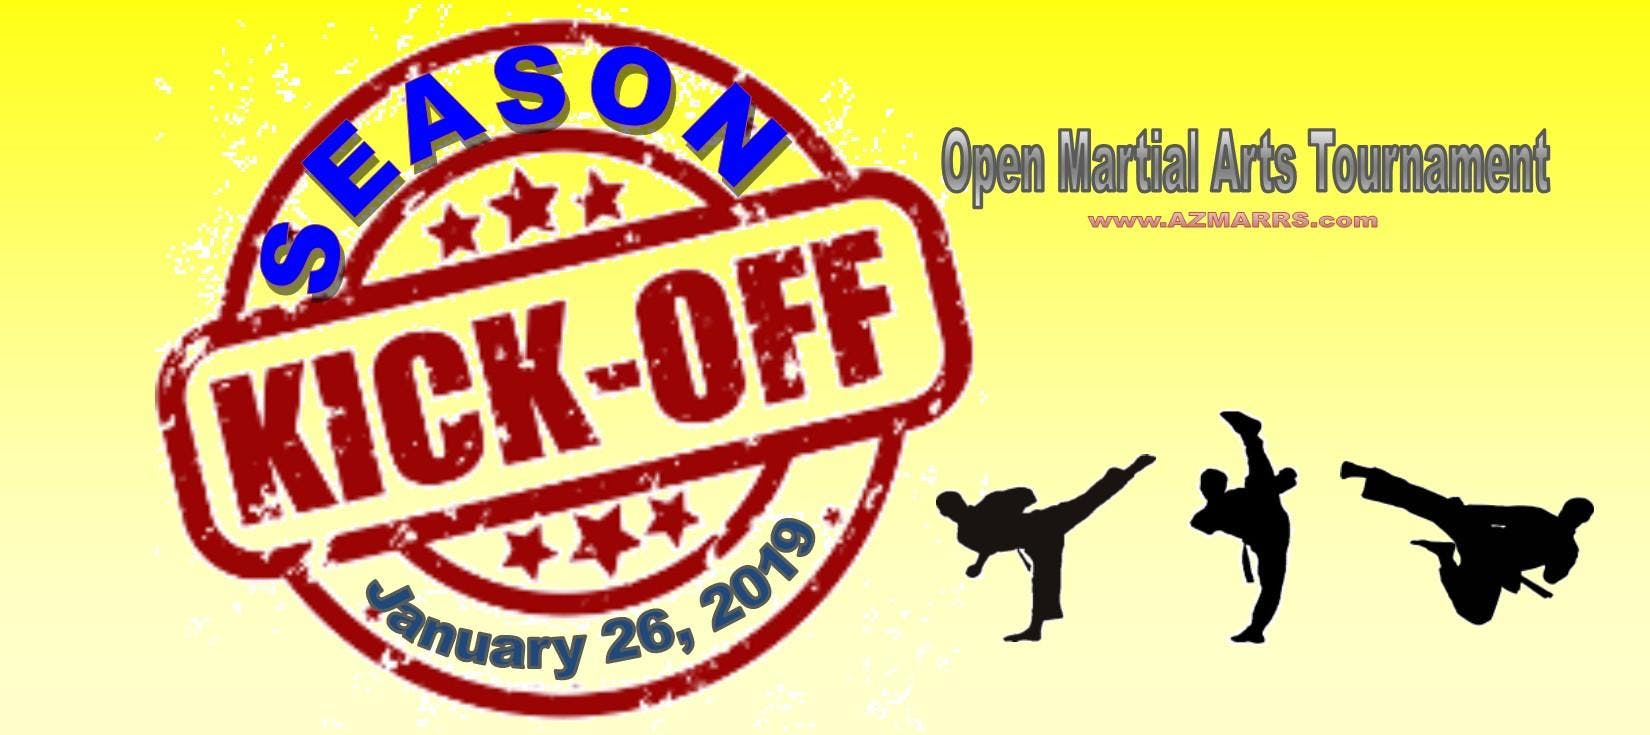 2019 Season Kick-Off Karate Tournament